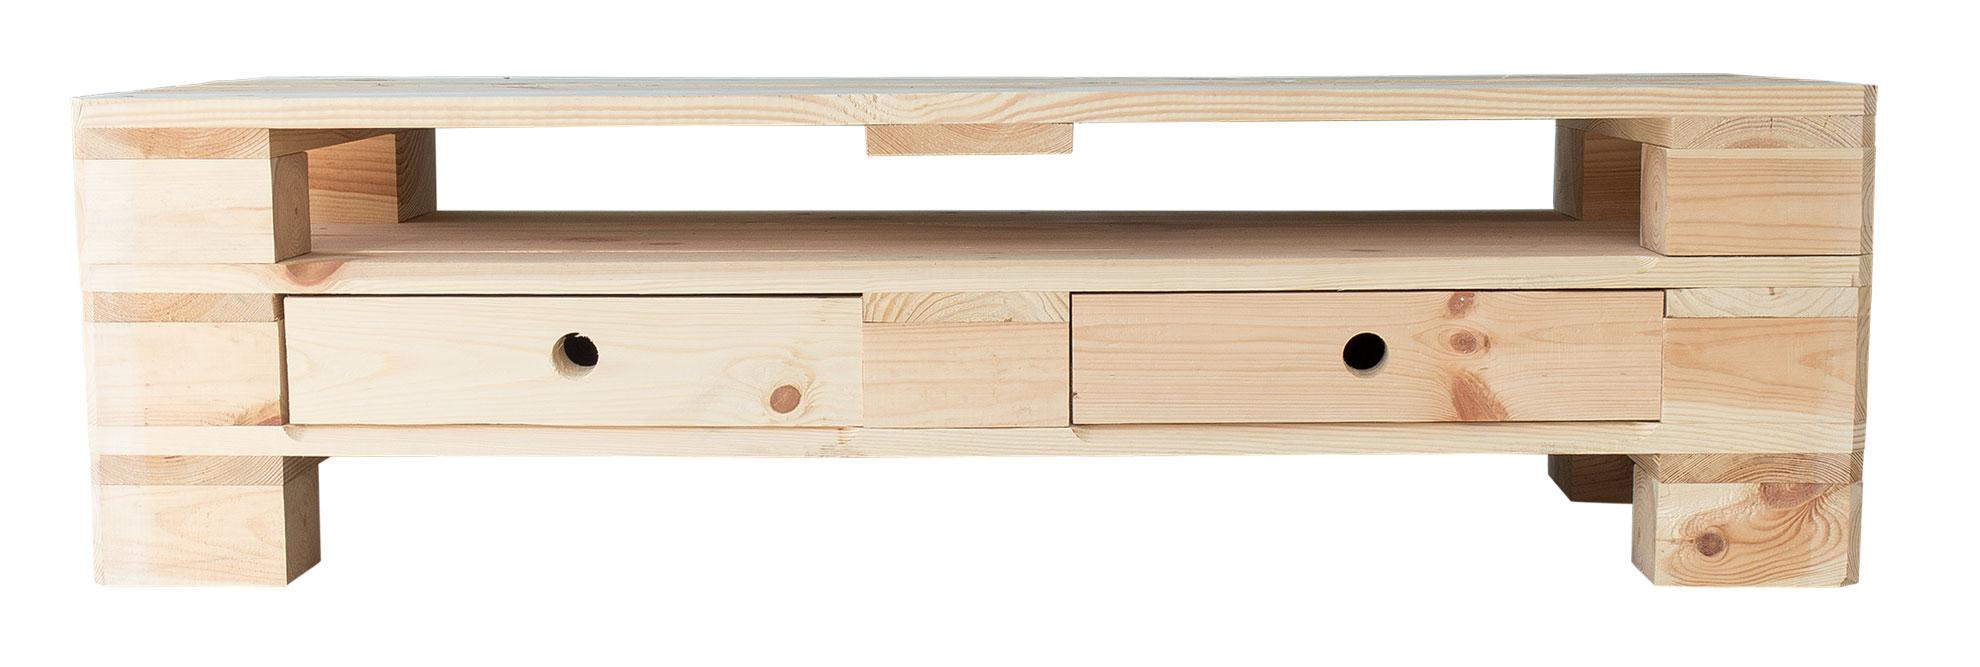 restposten m bel tv lowboard aus palettenholz 120x47x44cm obstkisten. Black Bedroom Furniture Sets. Home Design Ideas